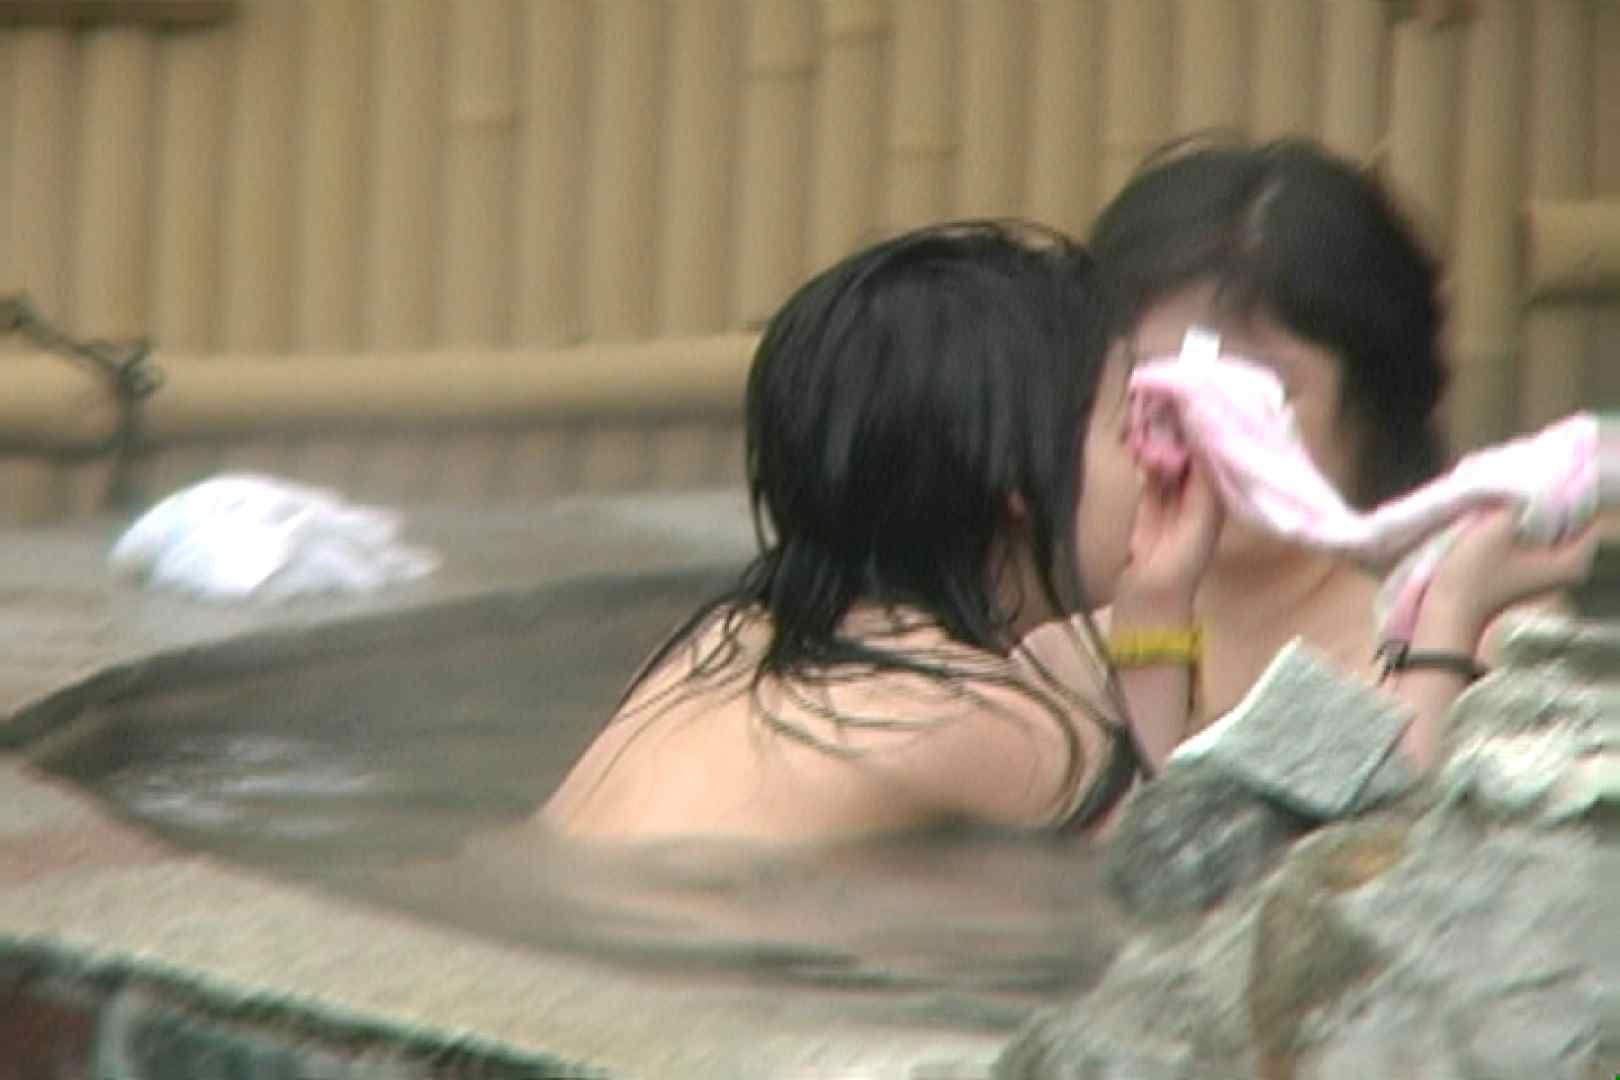 Aquaな露天風呂Vol.646 露天 のぞき動画画像 97画像 20